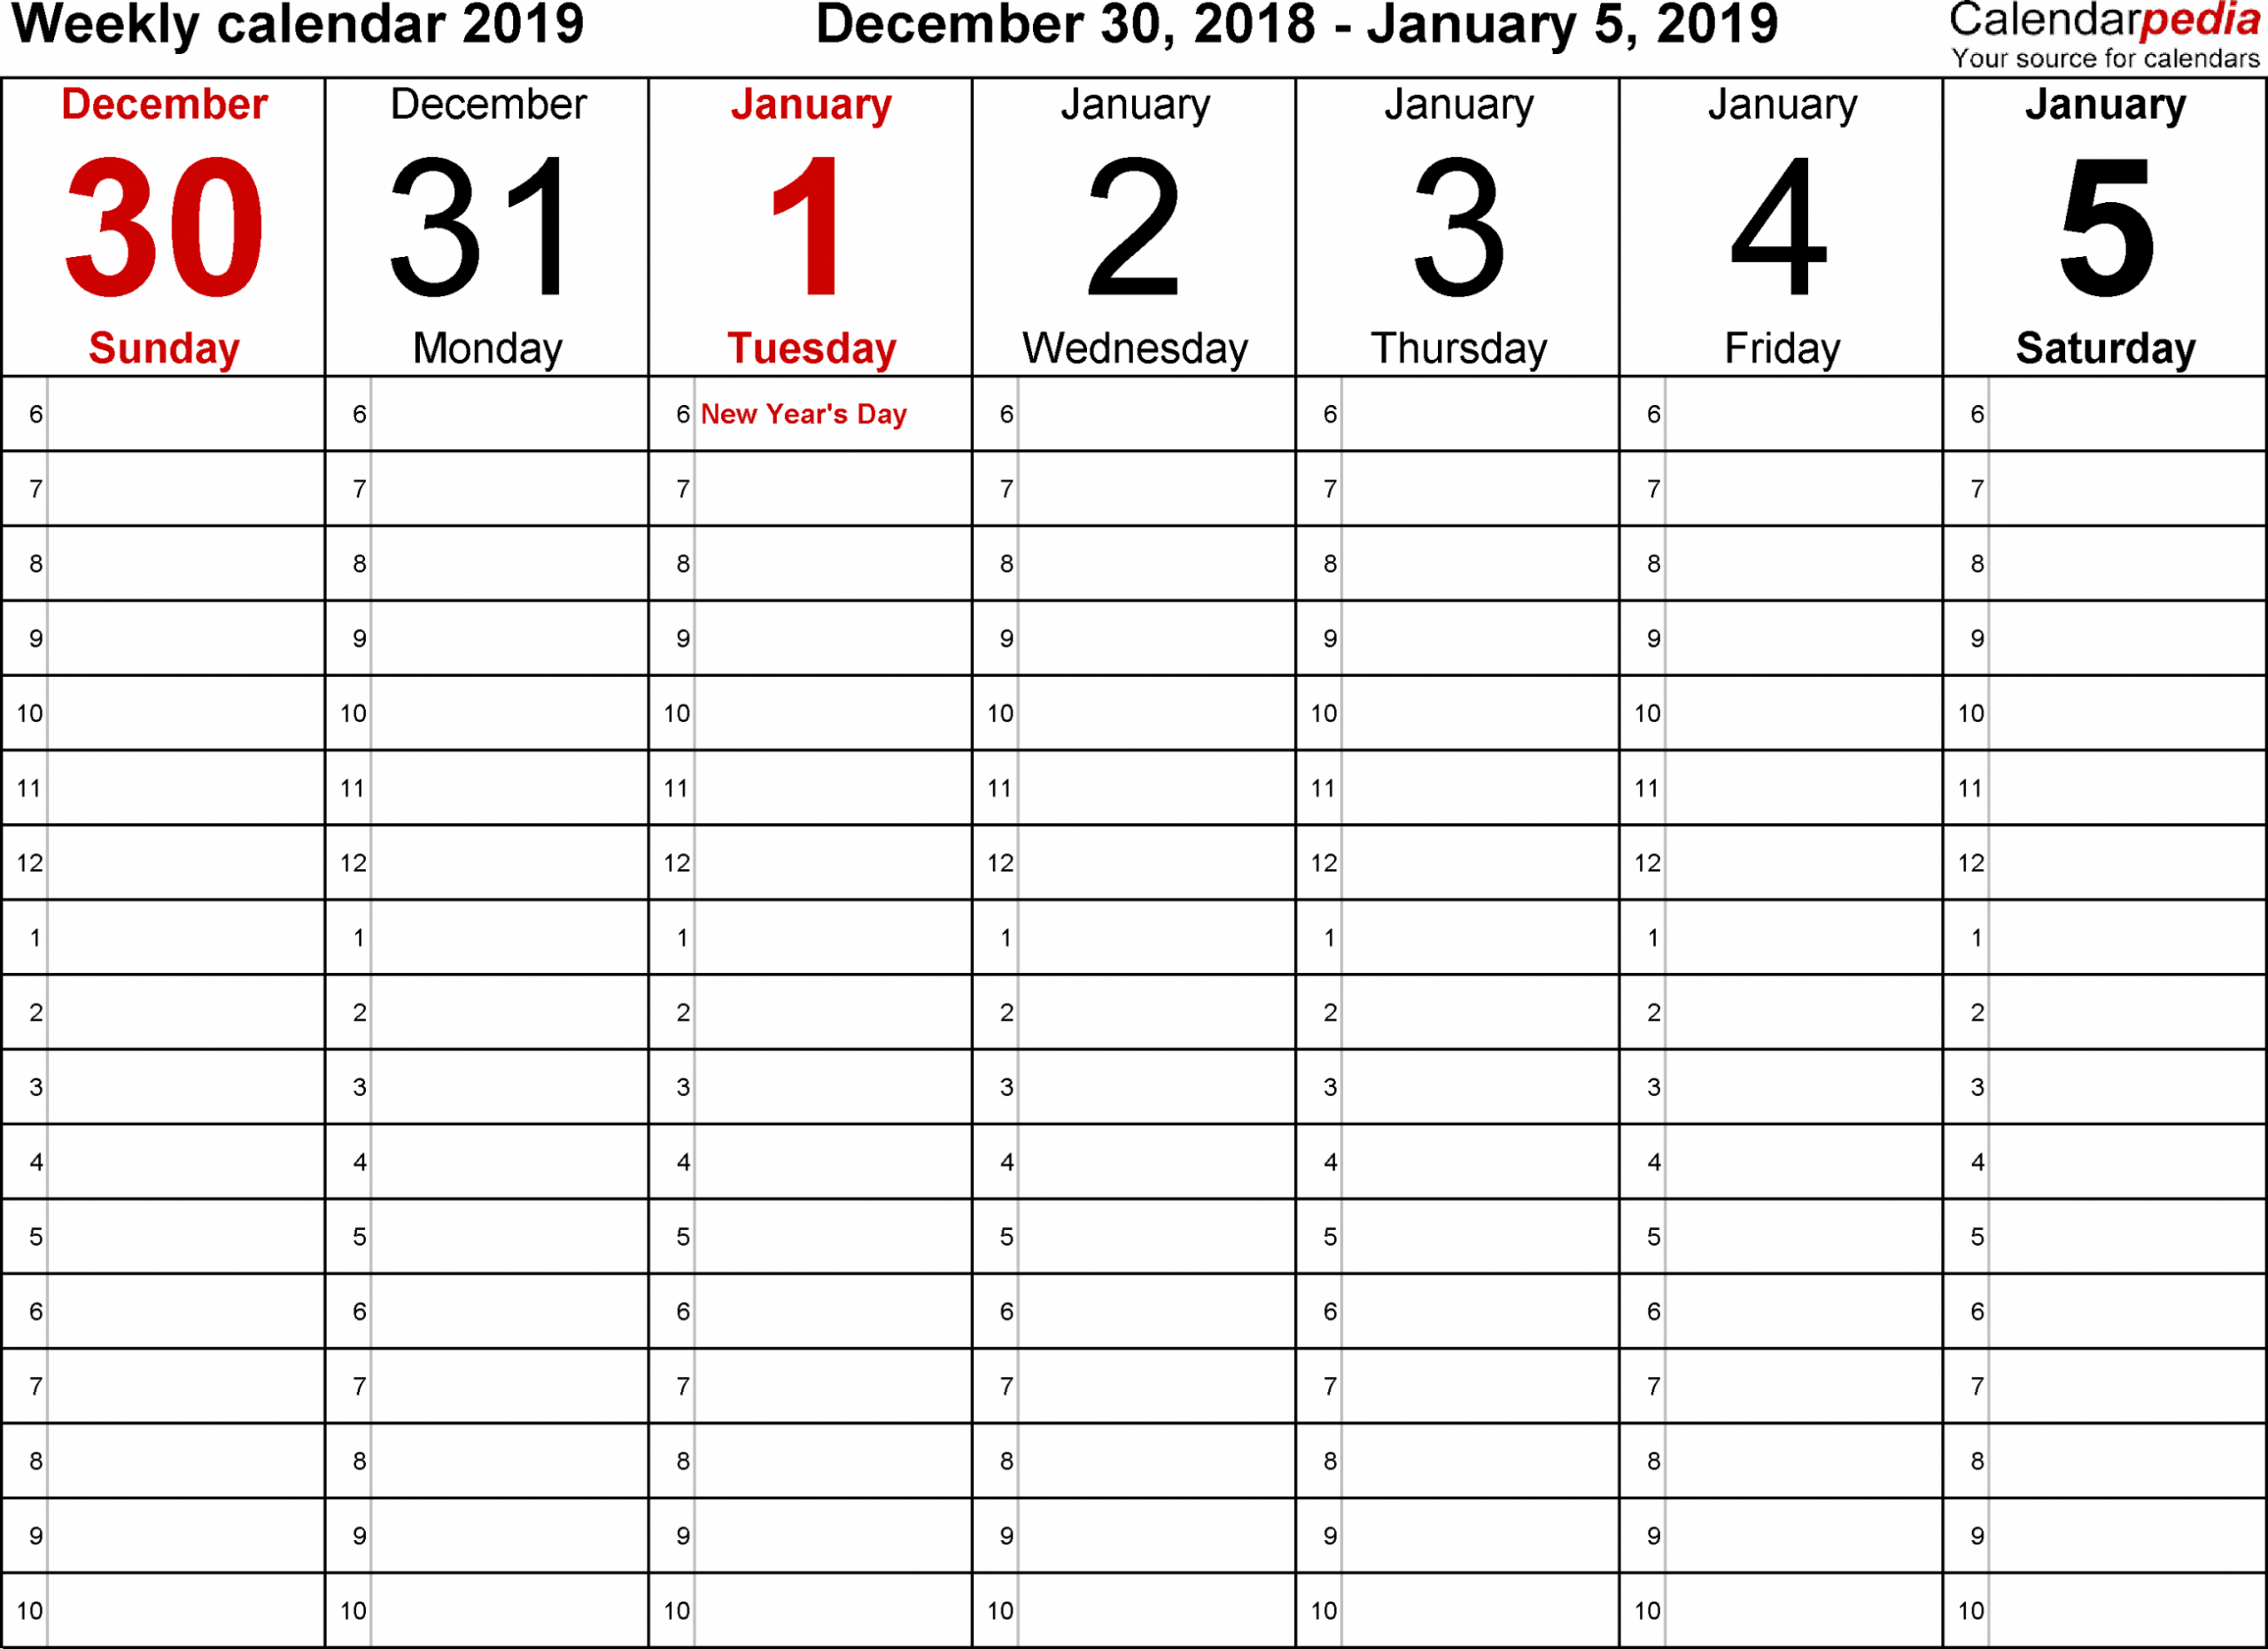 Daily Calendar 2019 Free Daily Calendar Printable 2019